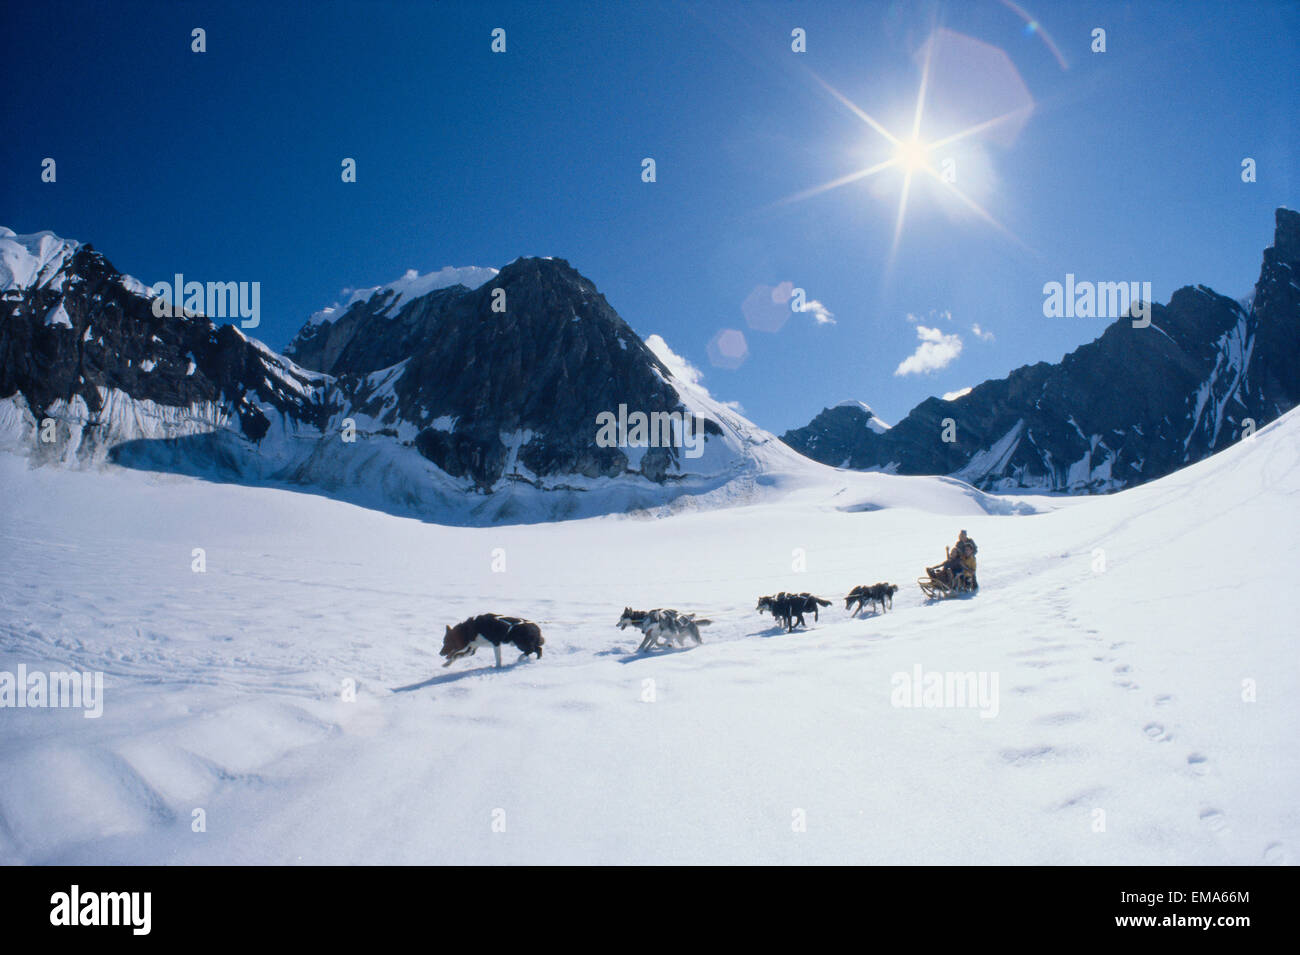 Alaska, Mt. Mckinley Area, Couple Dog Sledding In Snow, Mountains, Star Filter Sun - Stock Image